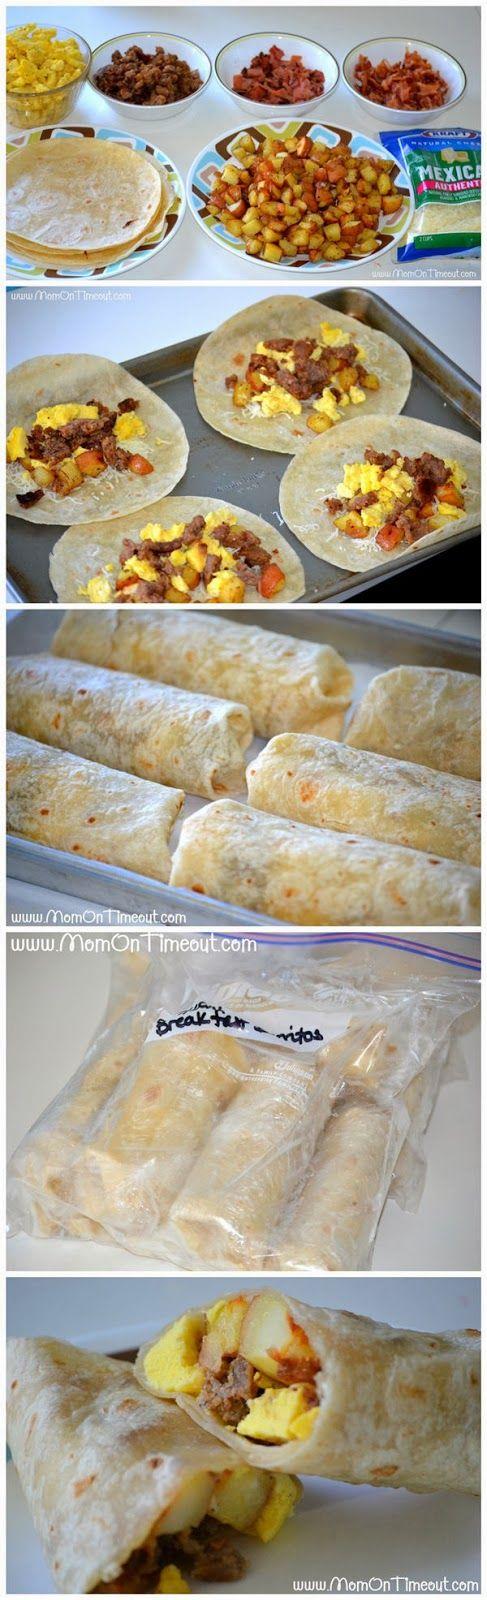 Breakfast Burrito Bonanza – A Freezer Meal Idea - kiss recipe